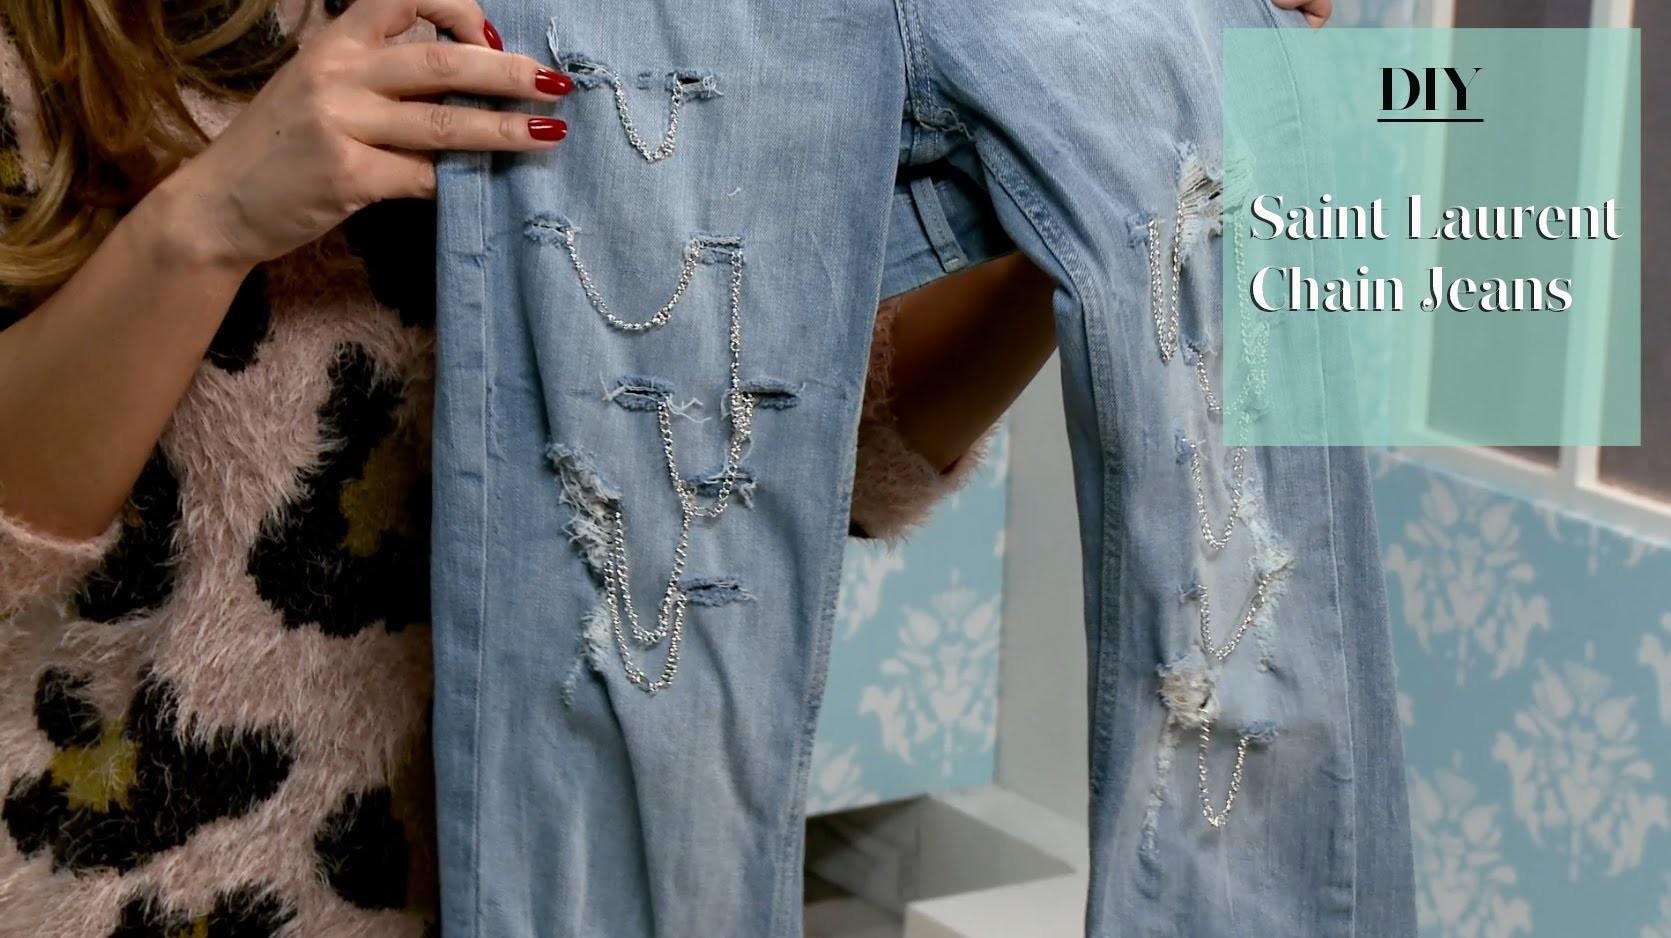 DIY: Saint Laurent Inspired Chain Jeans